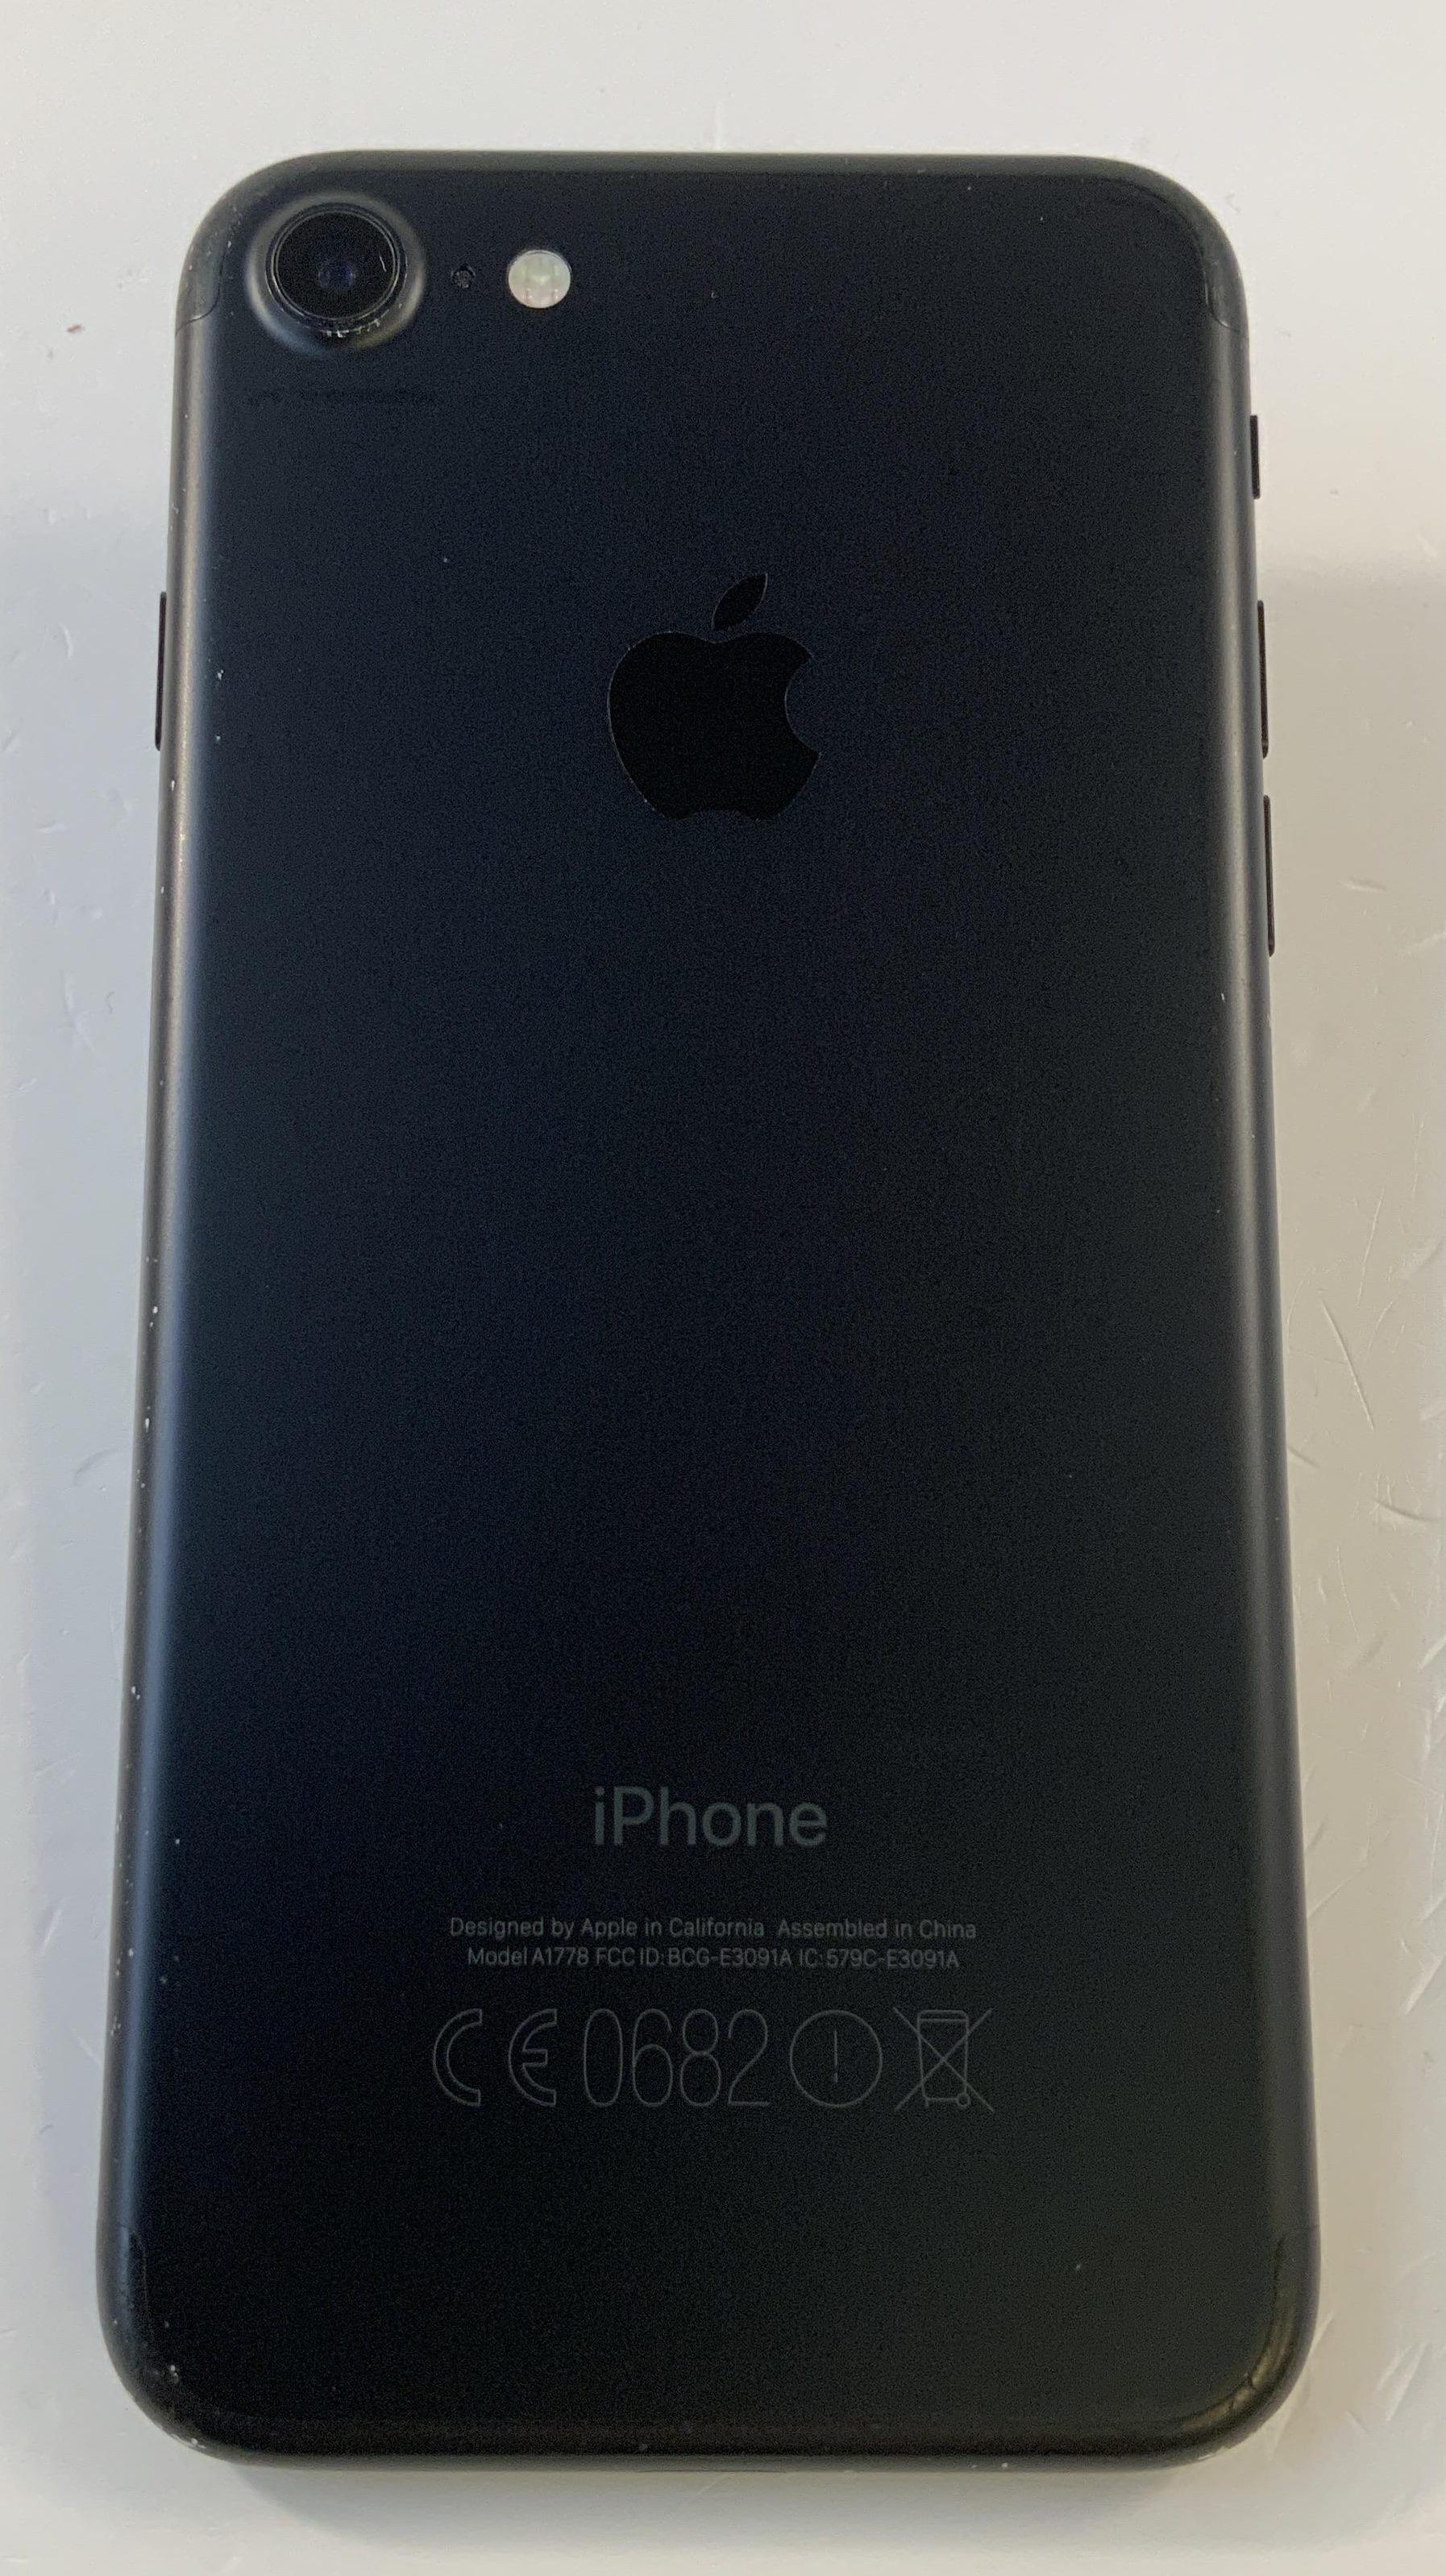 iPhone 7 32GB, 32GB, Black, Afbeelding 2